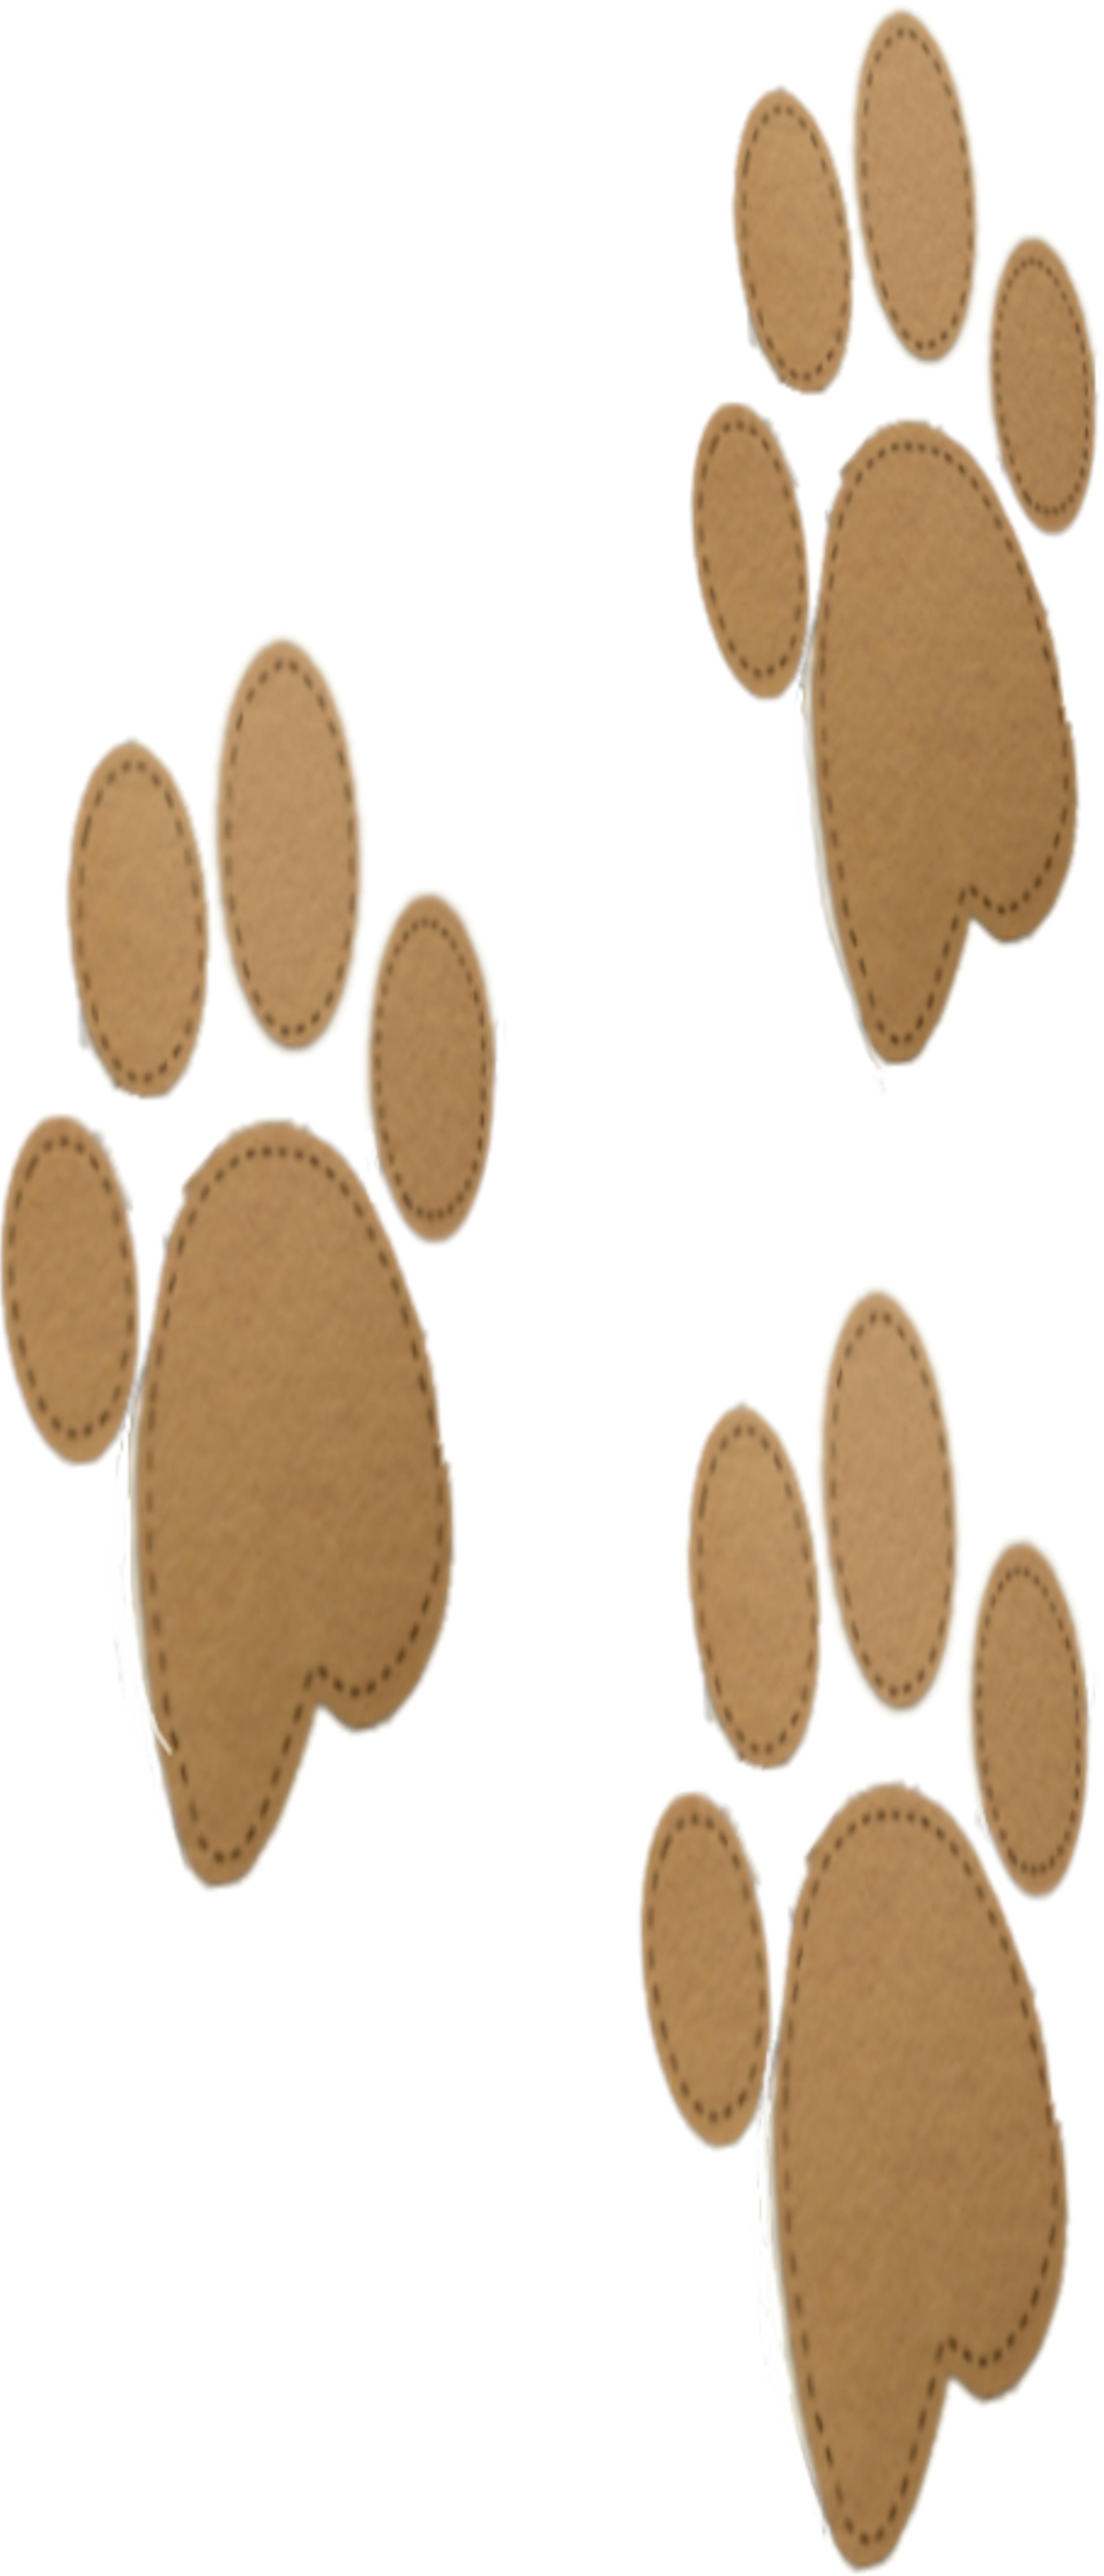 felt paw prints